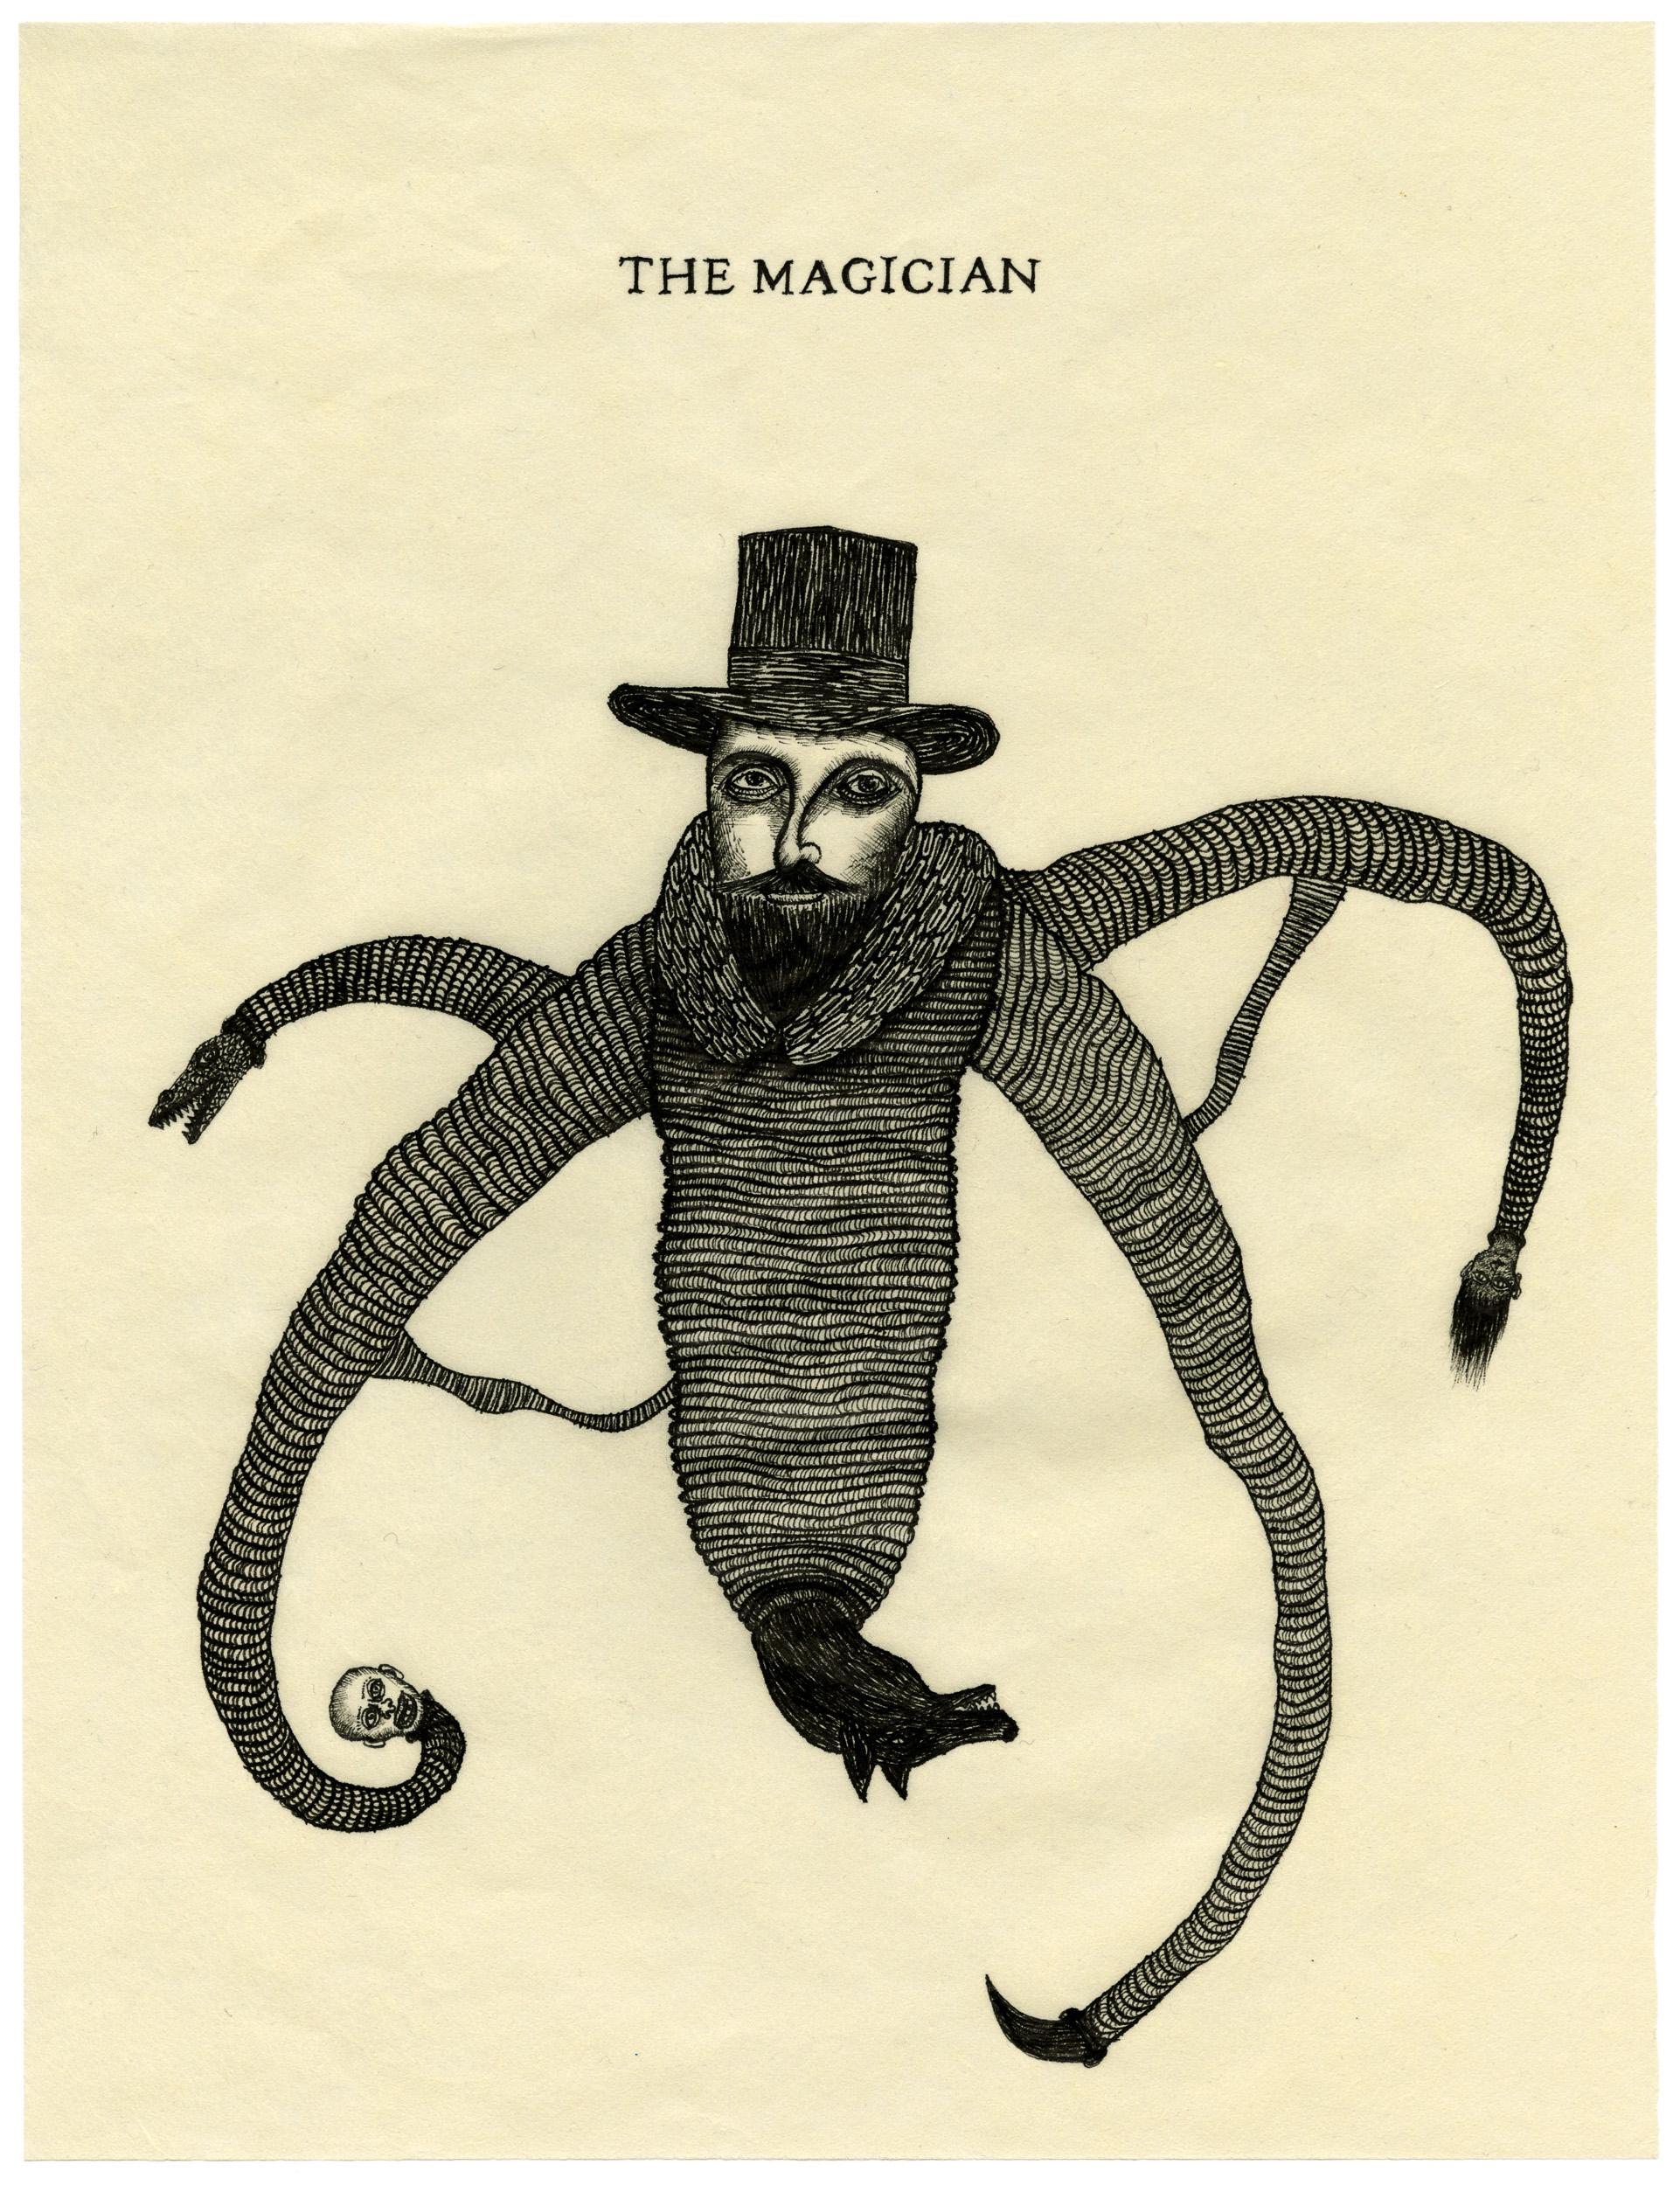 THE MAGICIAN, 32x24 cm